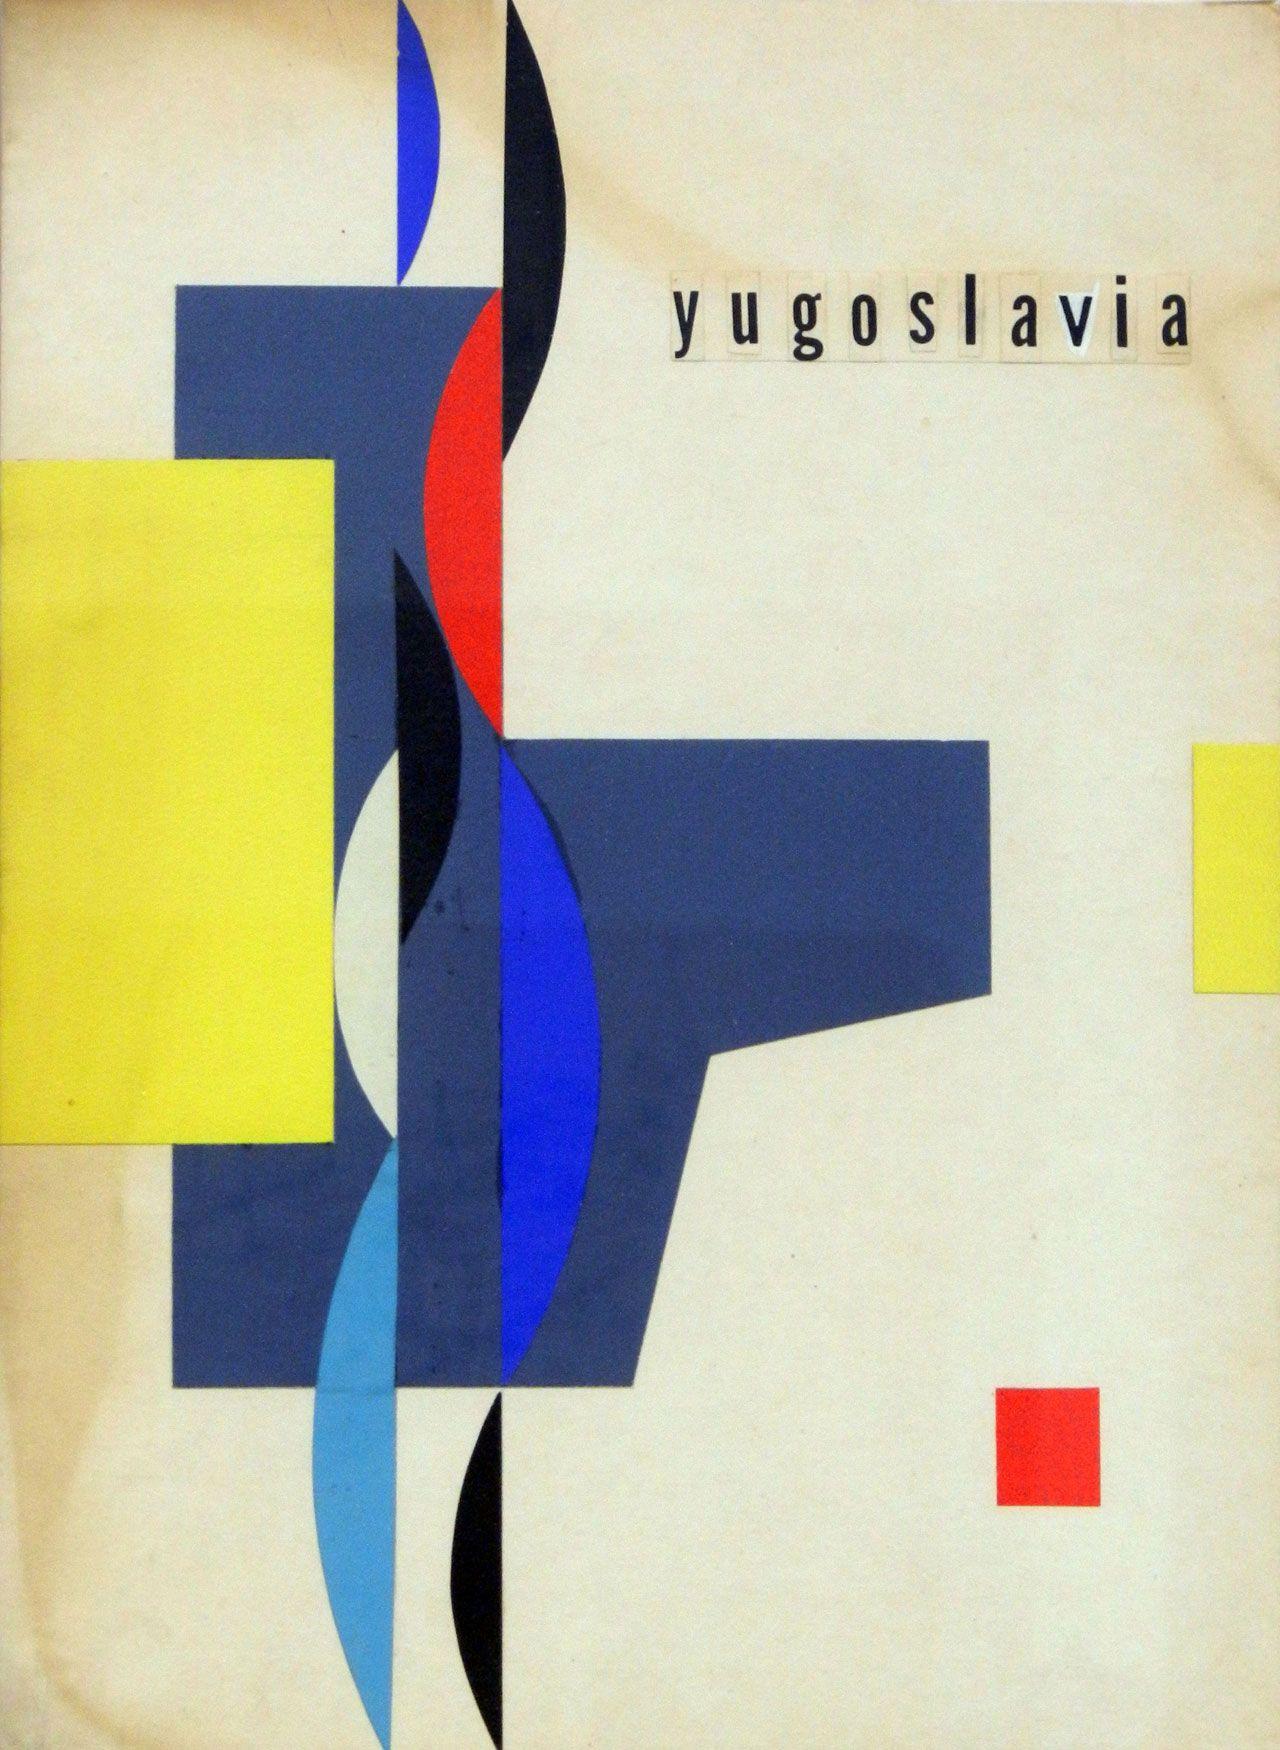 Yugoslavia Book Cover Design Vintage Posters Graphic Design Illustration